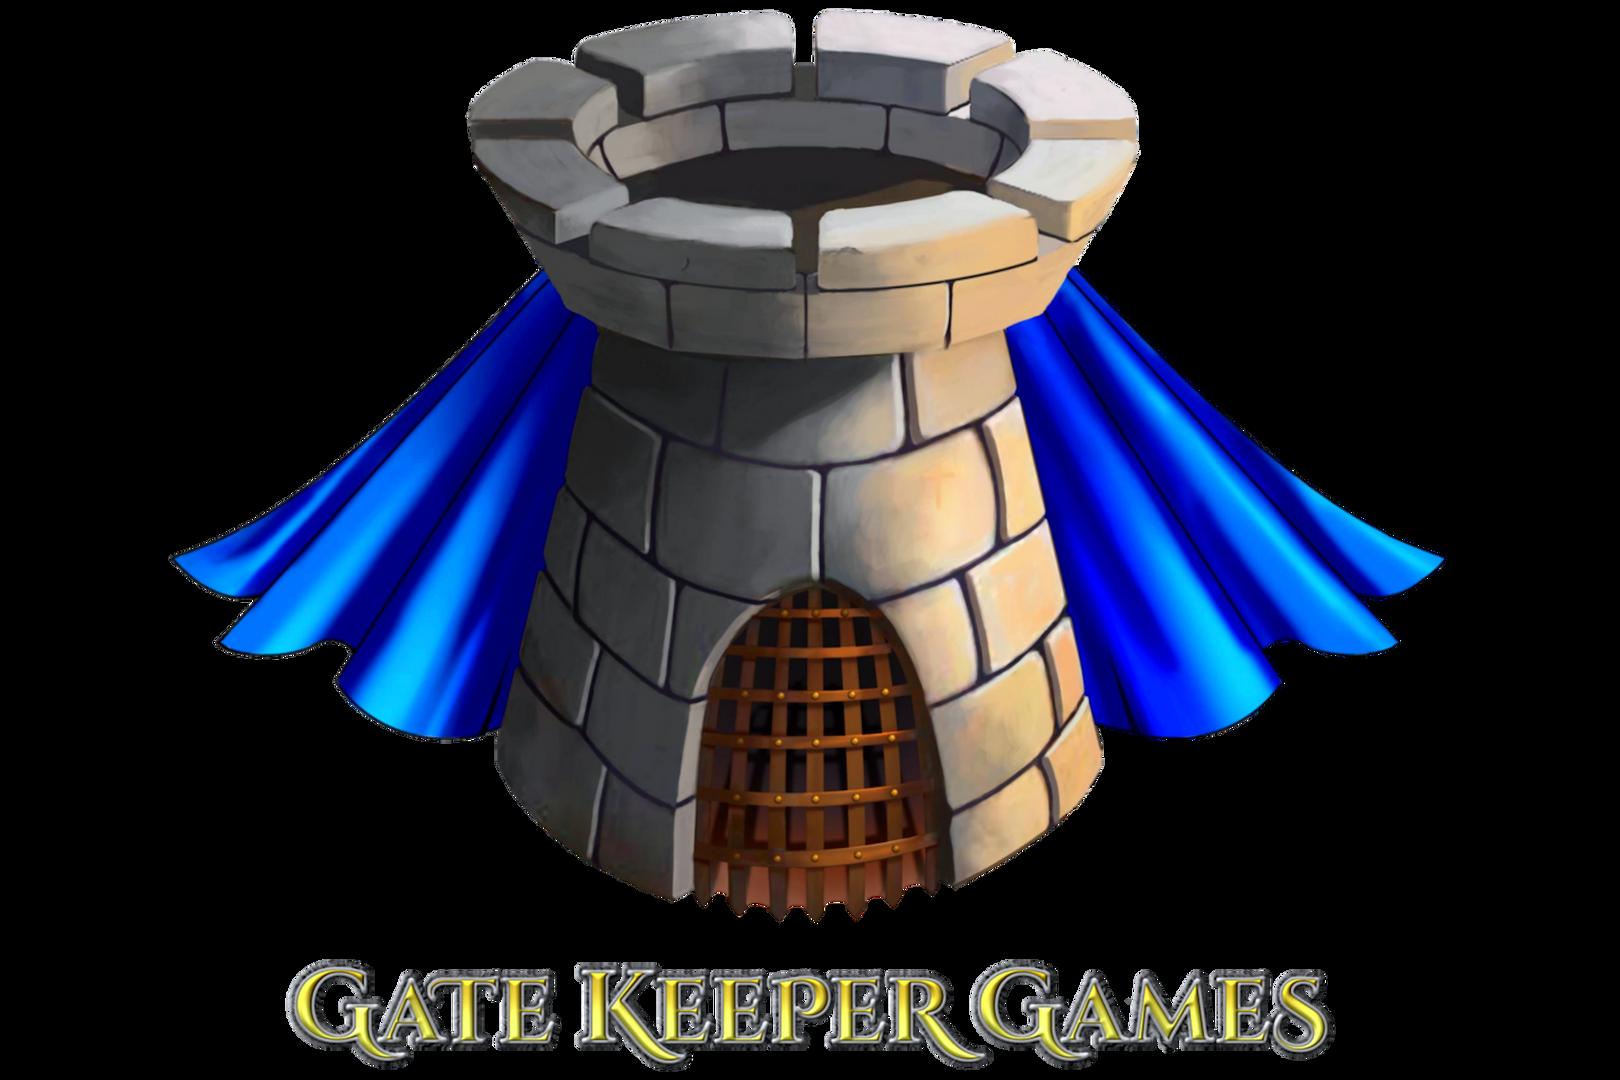 gate keeper games logo 1920x1280.png